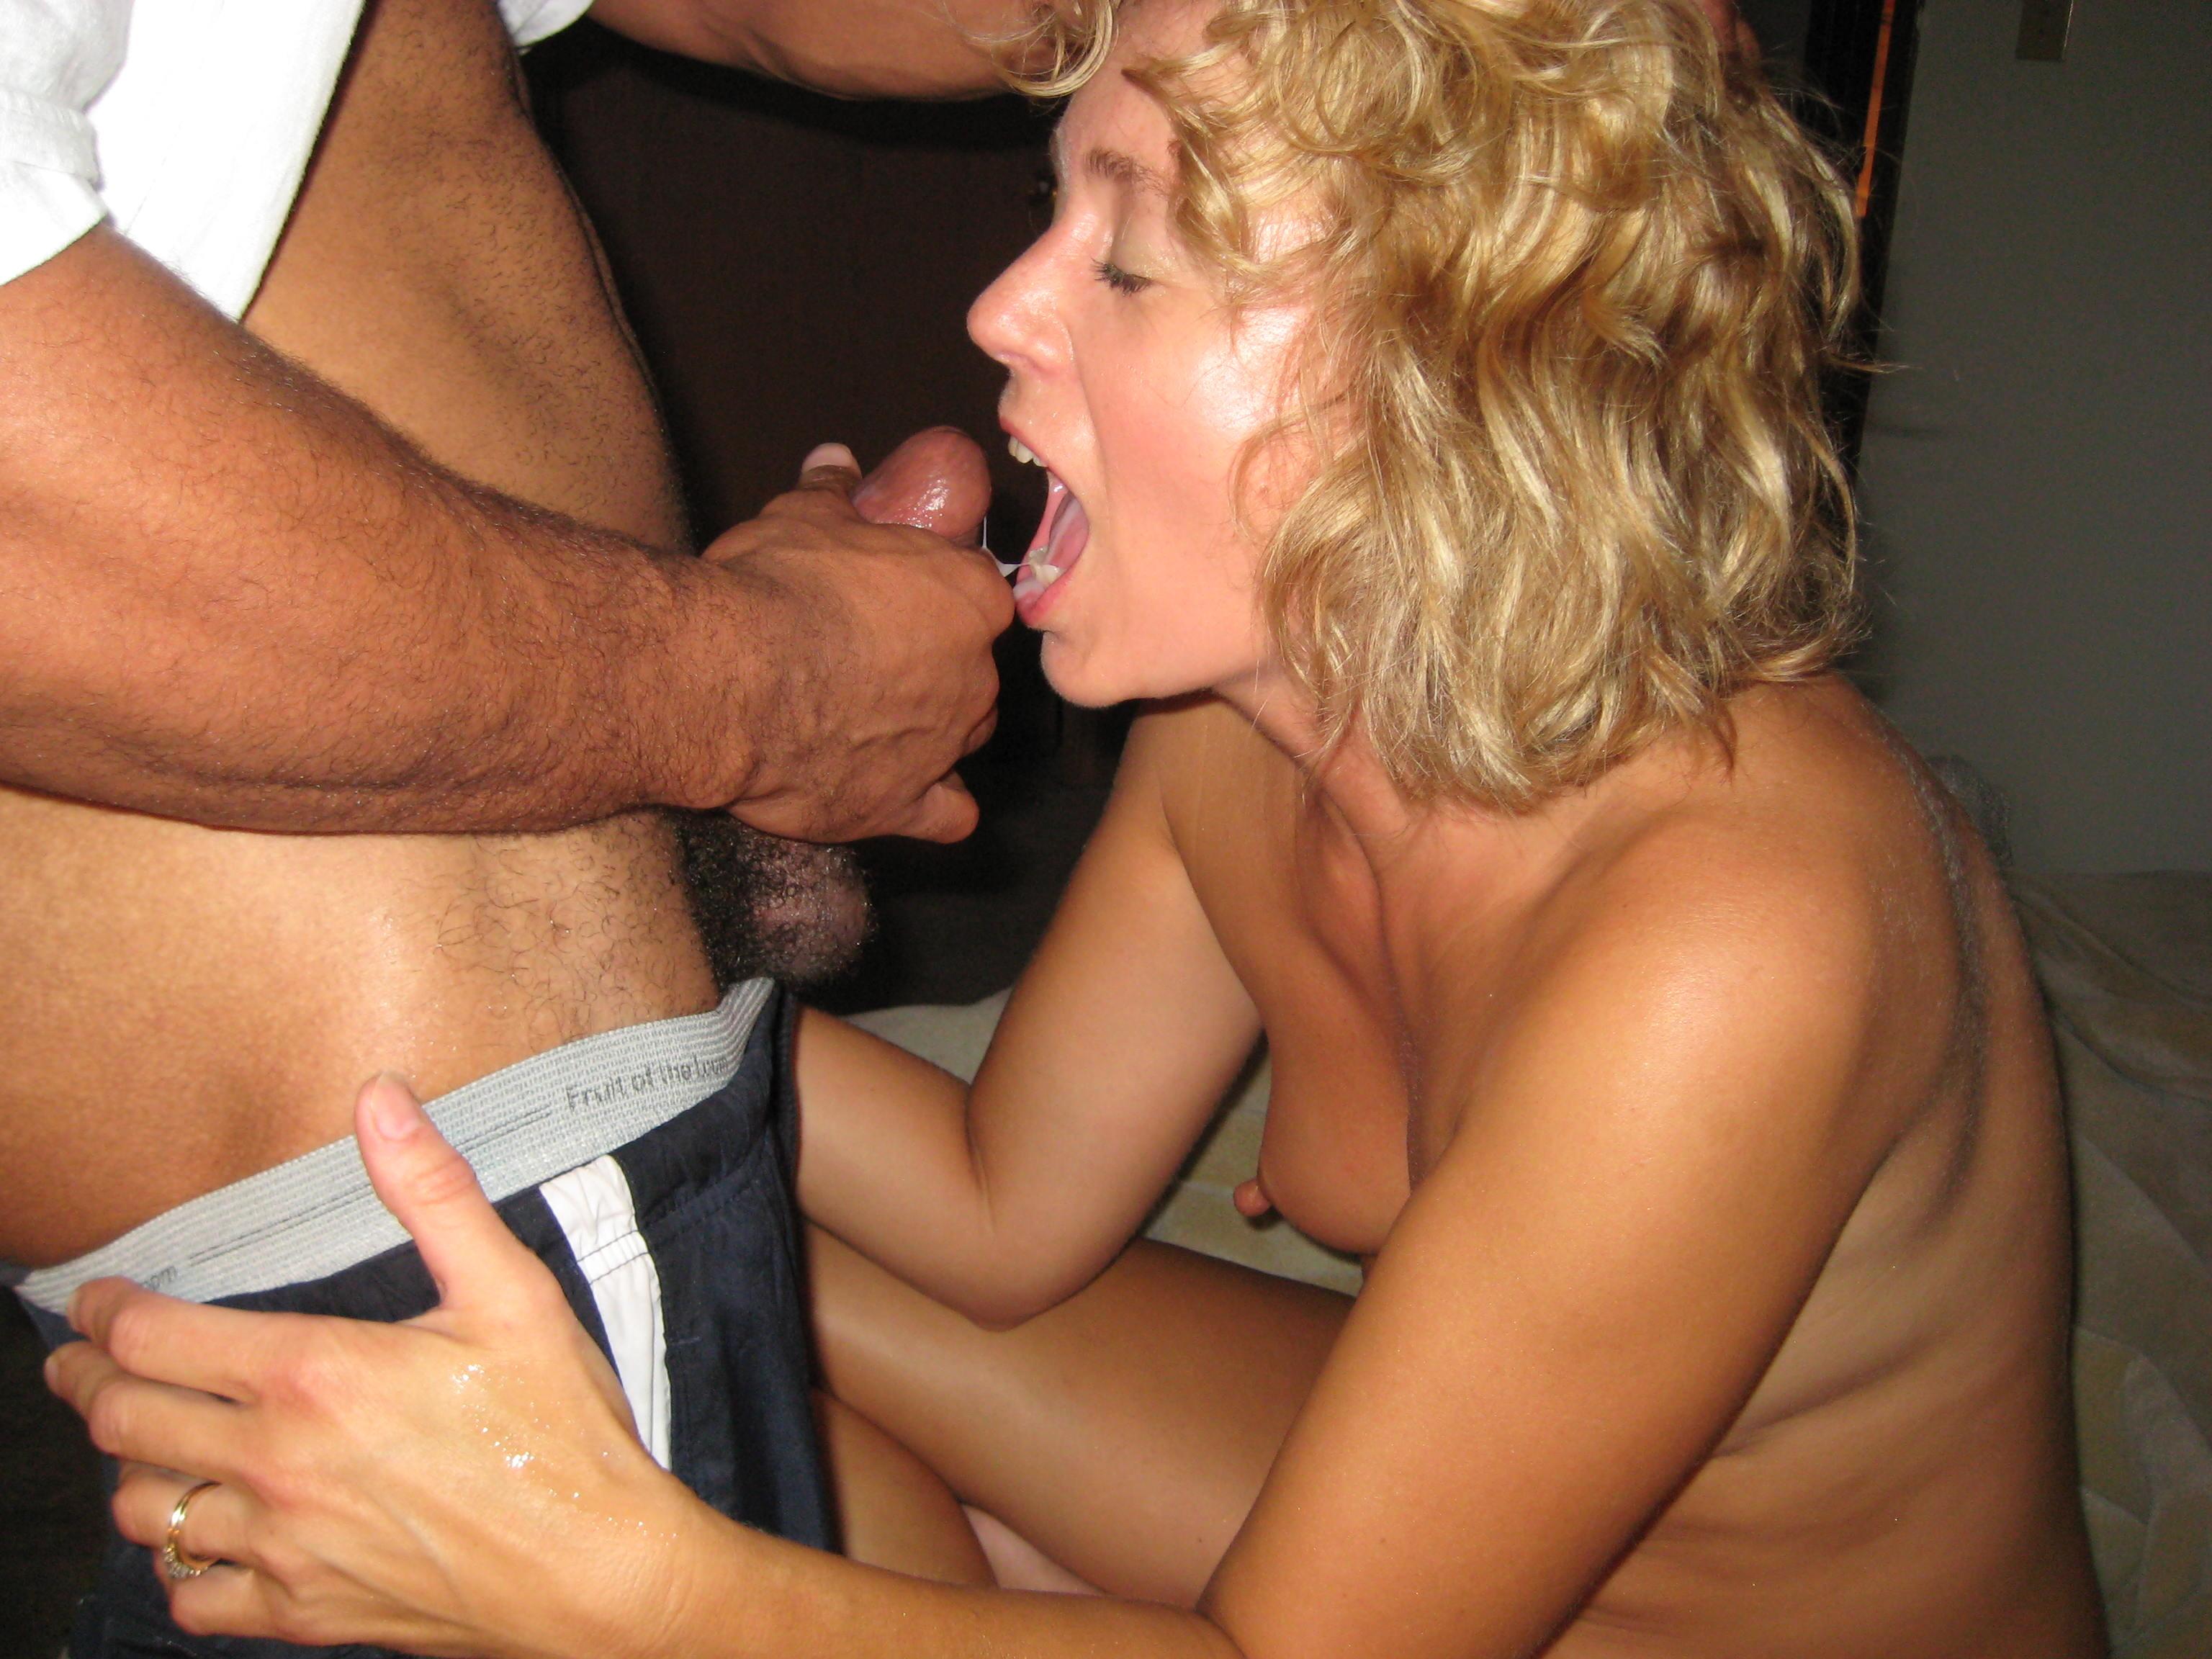 Jav Bbw Cheating Wife Titjob And Oral Sex Subtitled Tnaflix Porn Pics